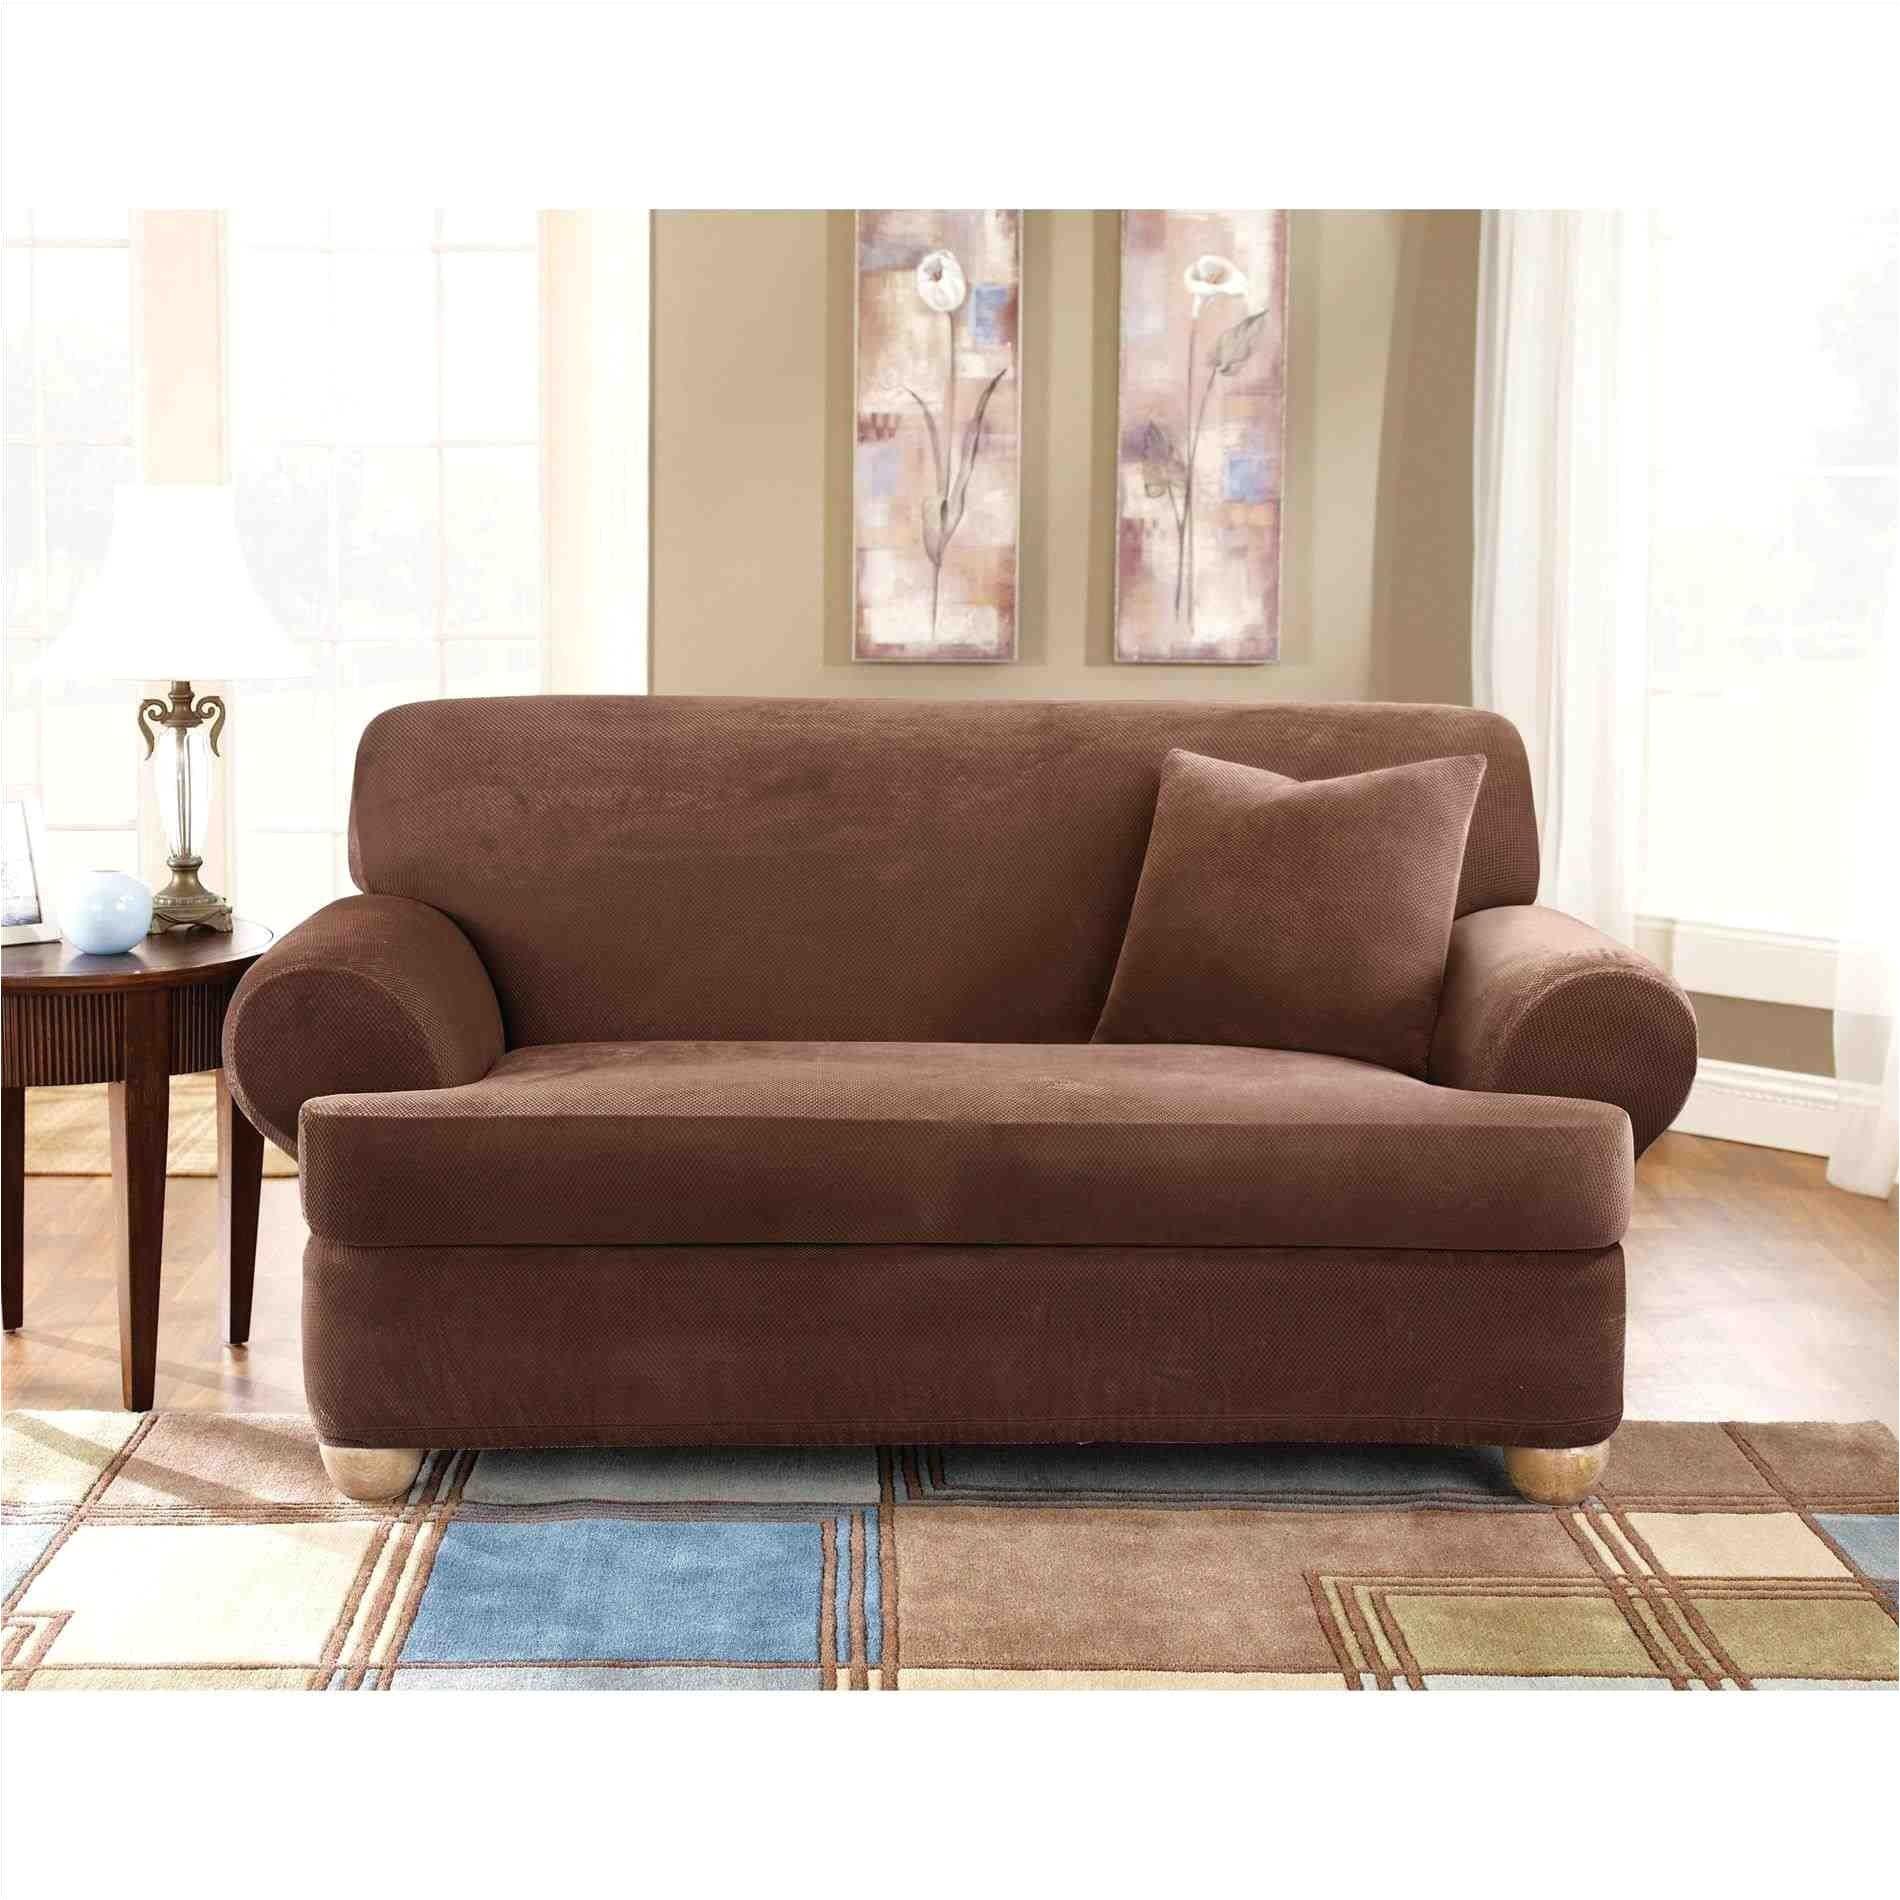 cheap sofa dubai full size of sofa set for in saudi arabia in majlis